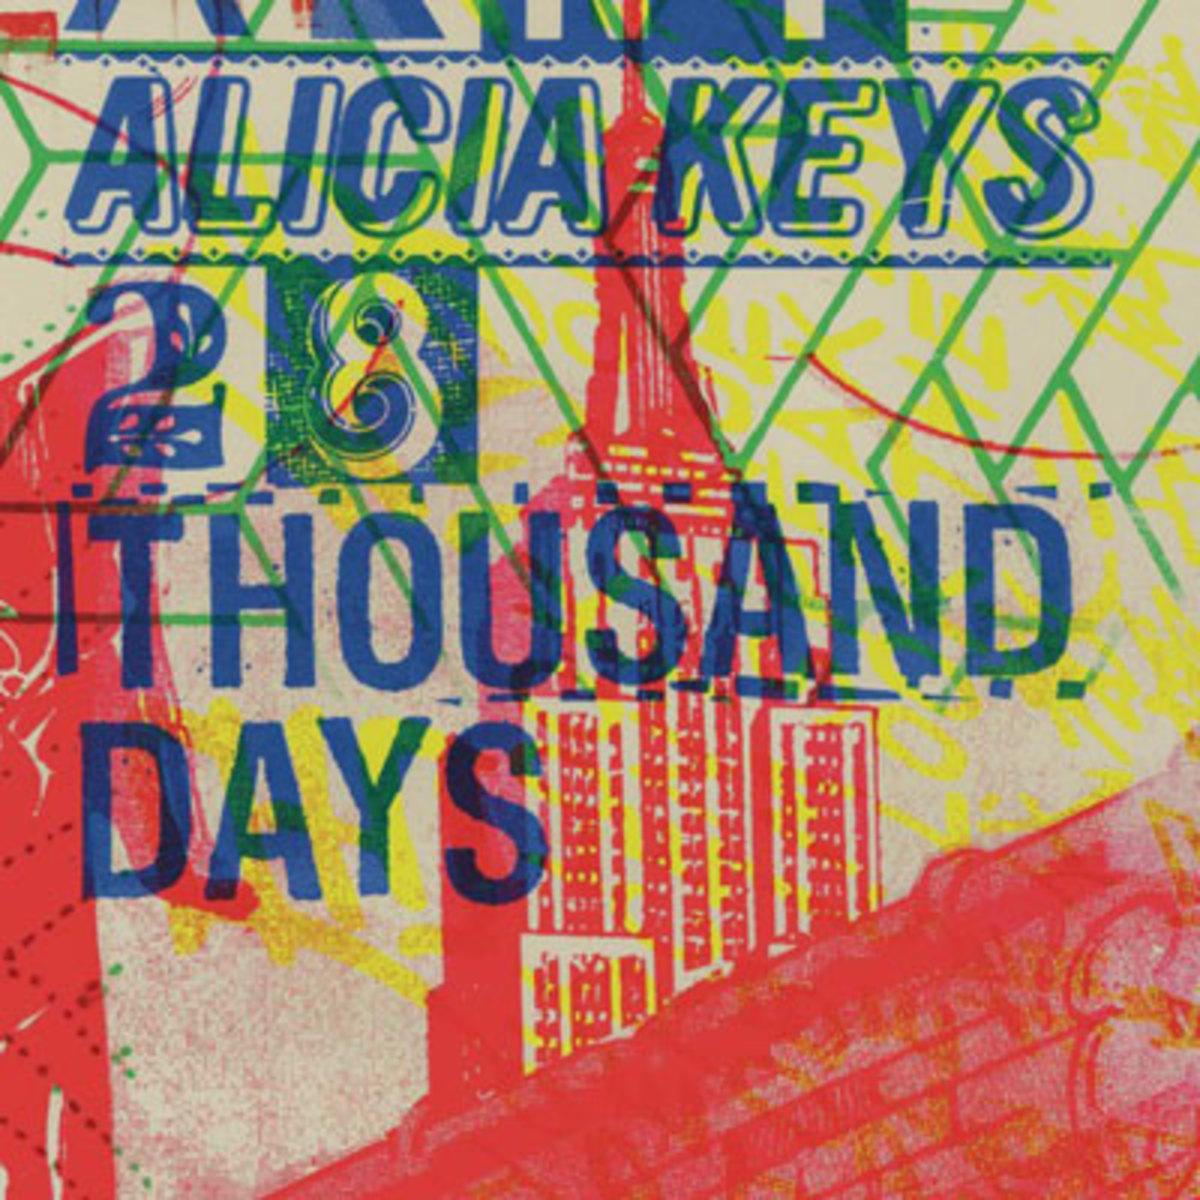 alicia-keys-28-thousand-days.jpg